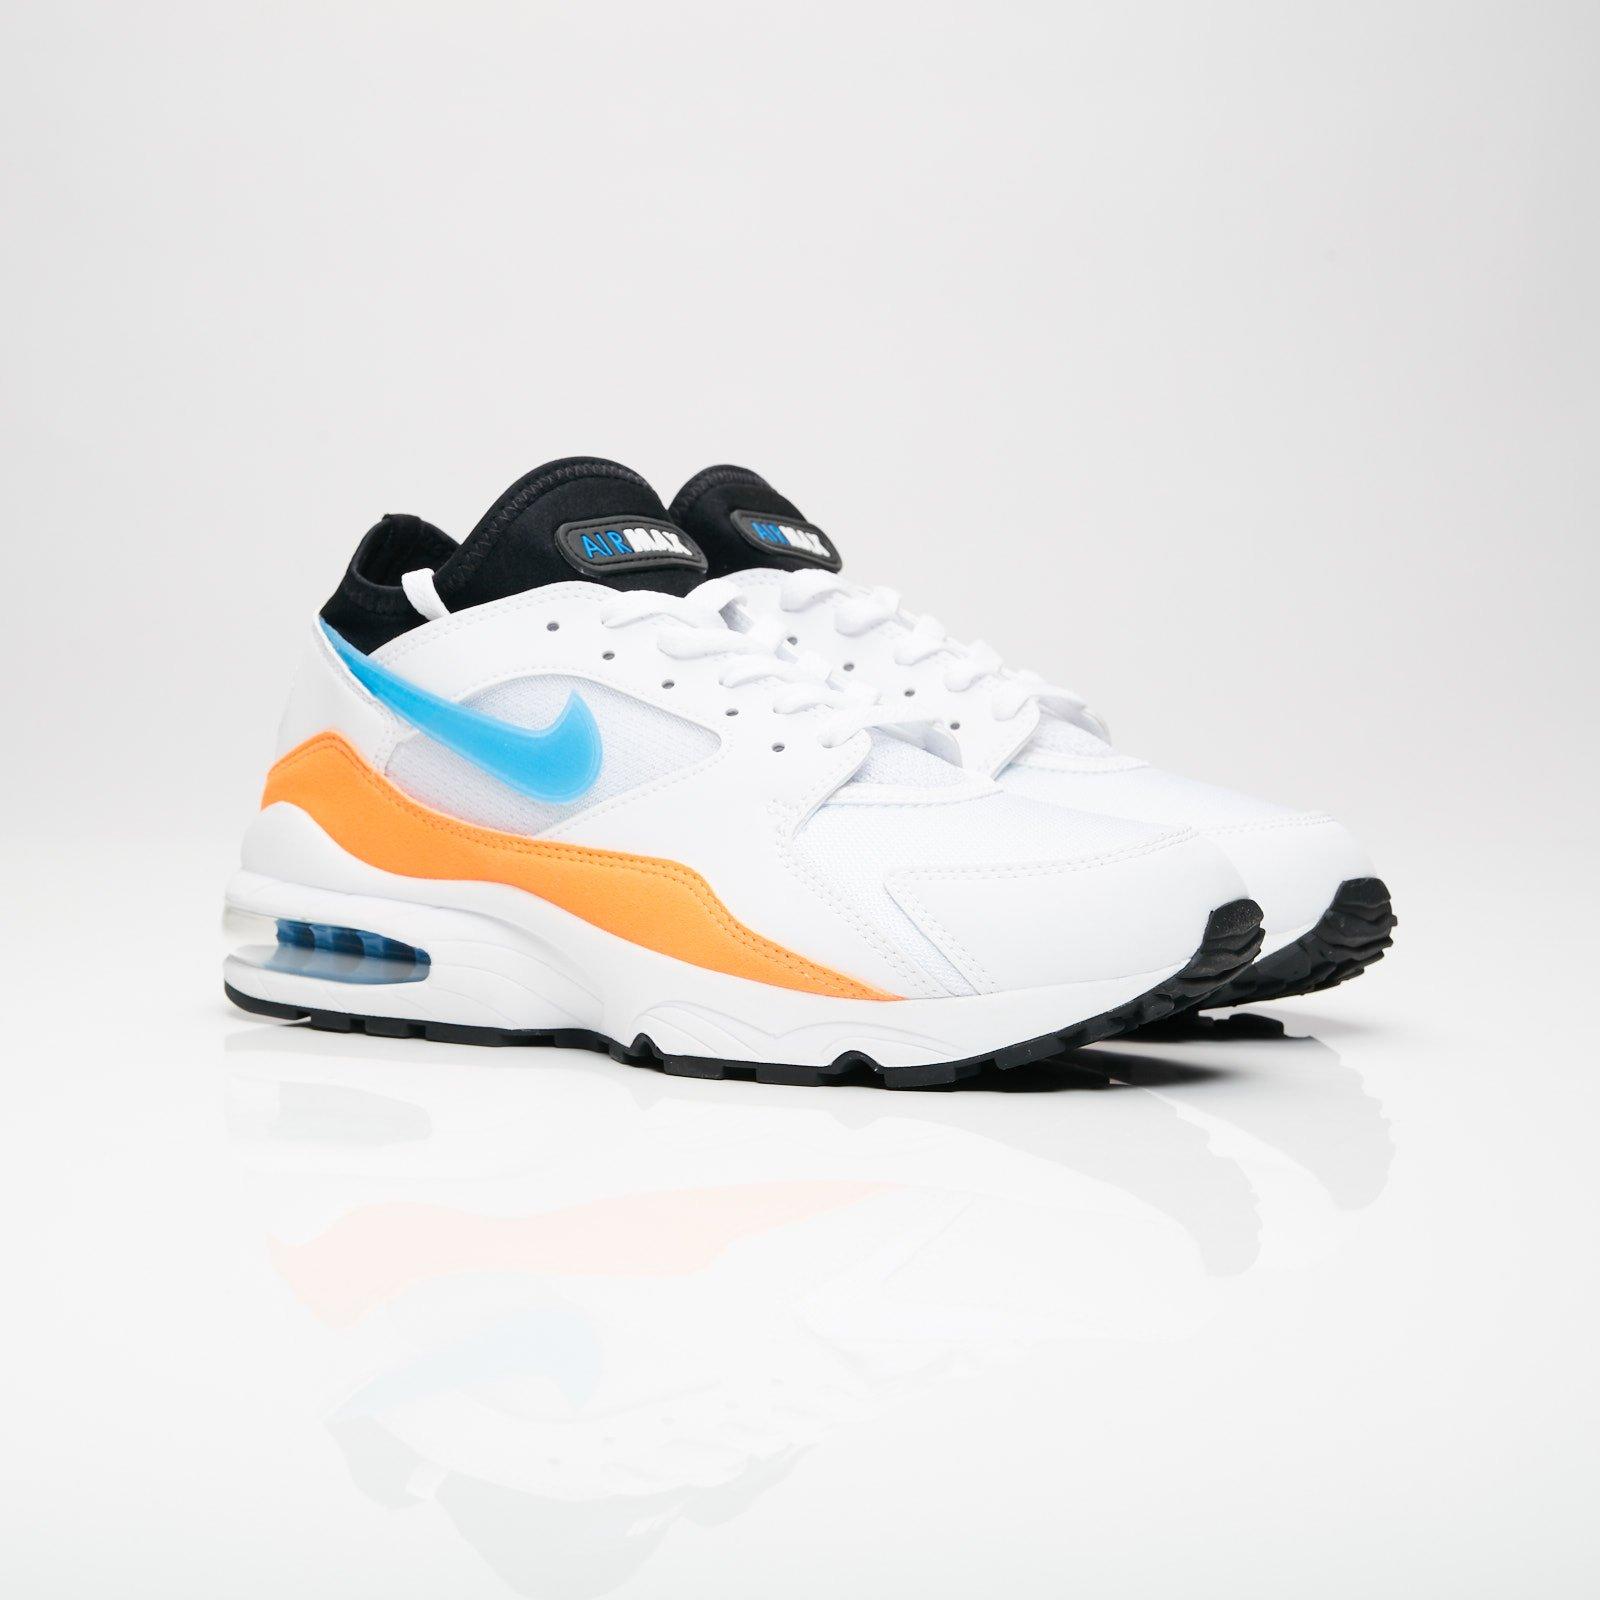 Nike Air Max 93 - 306551-104 - Sneakersnstuff  63bb0c9df